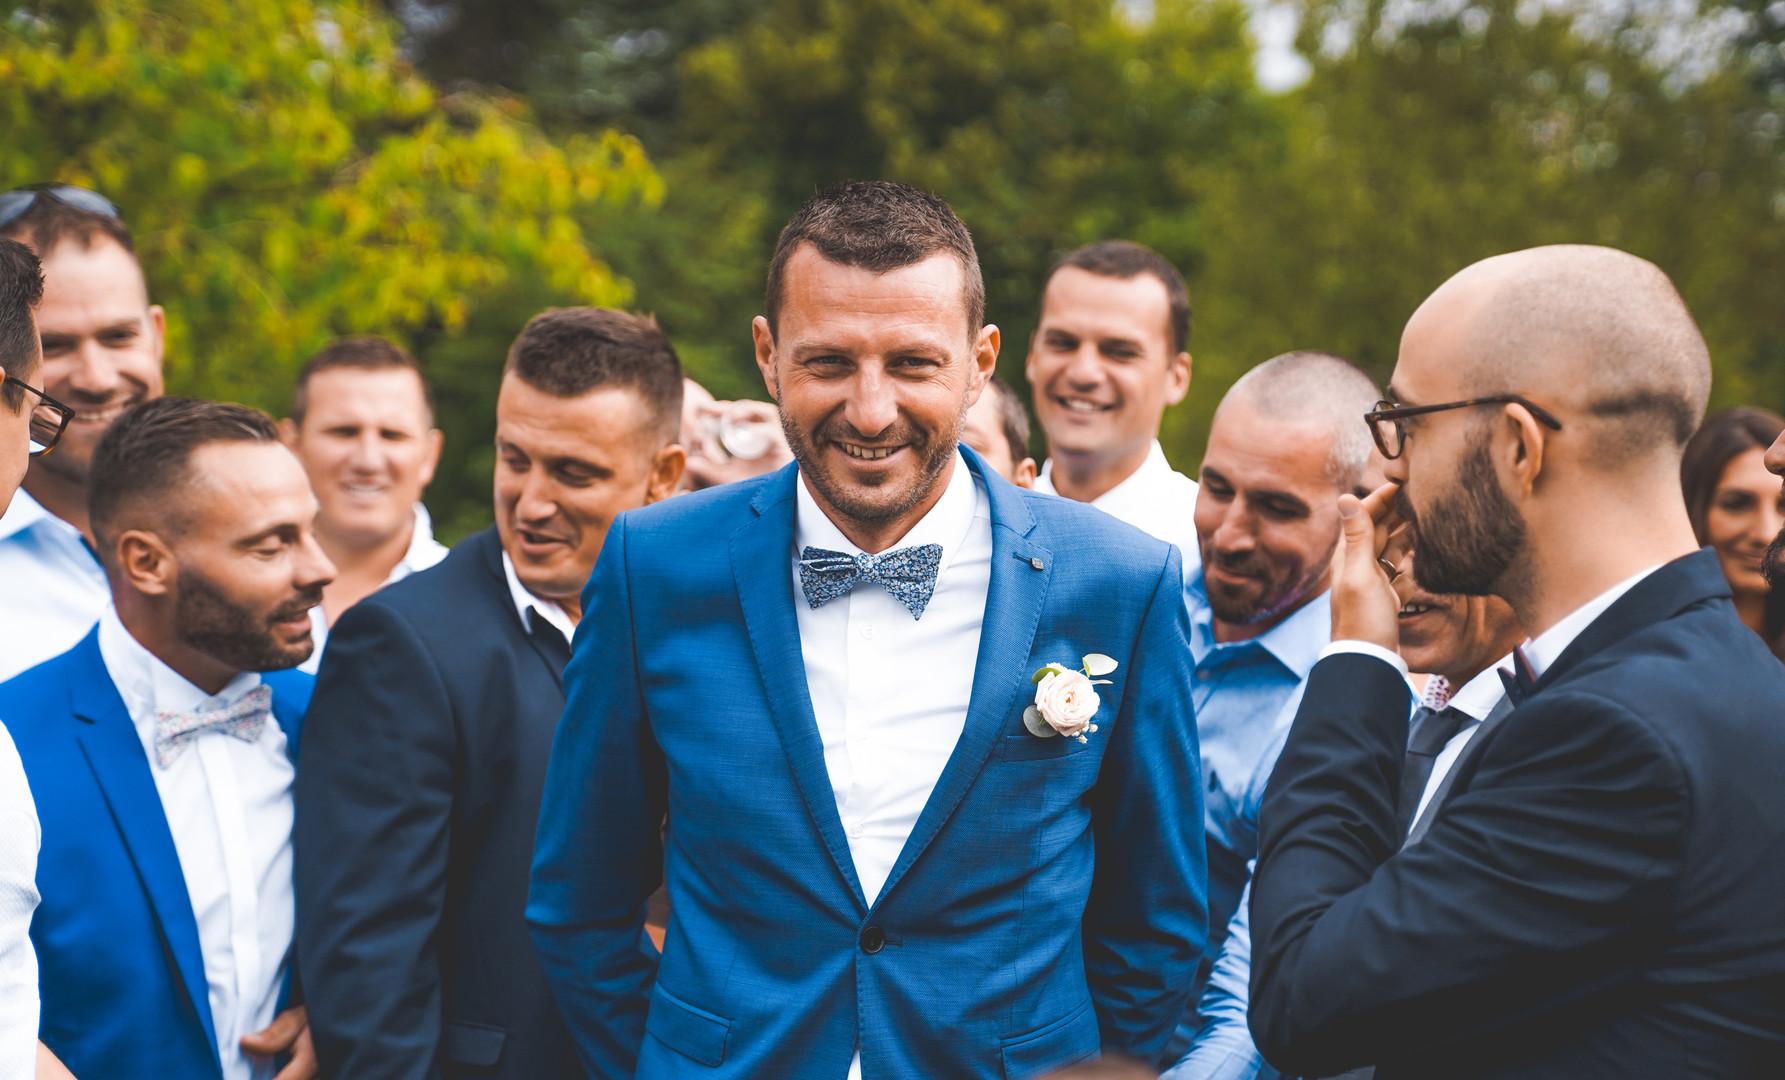 ANA754.jpgphoto moteur et action photographe macon mariage numerisation videaste film